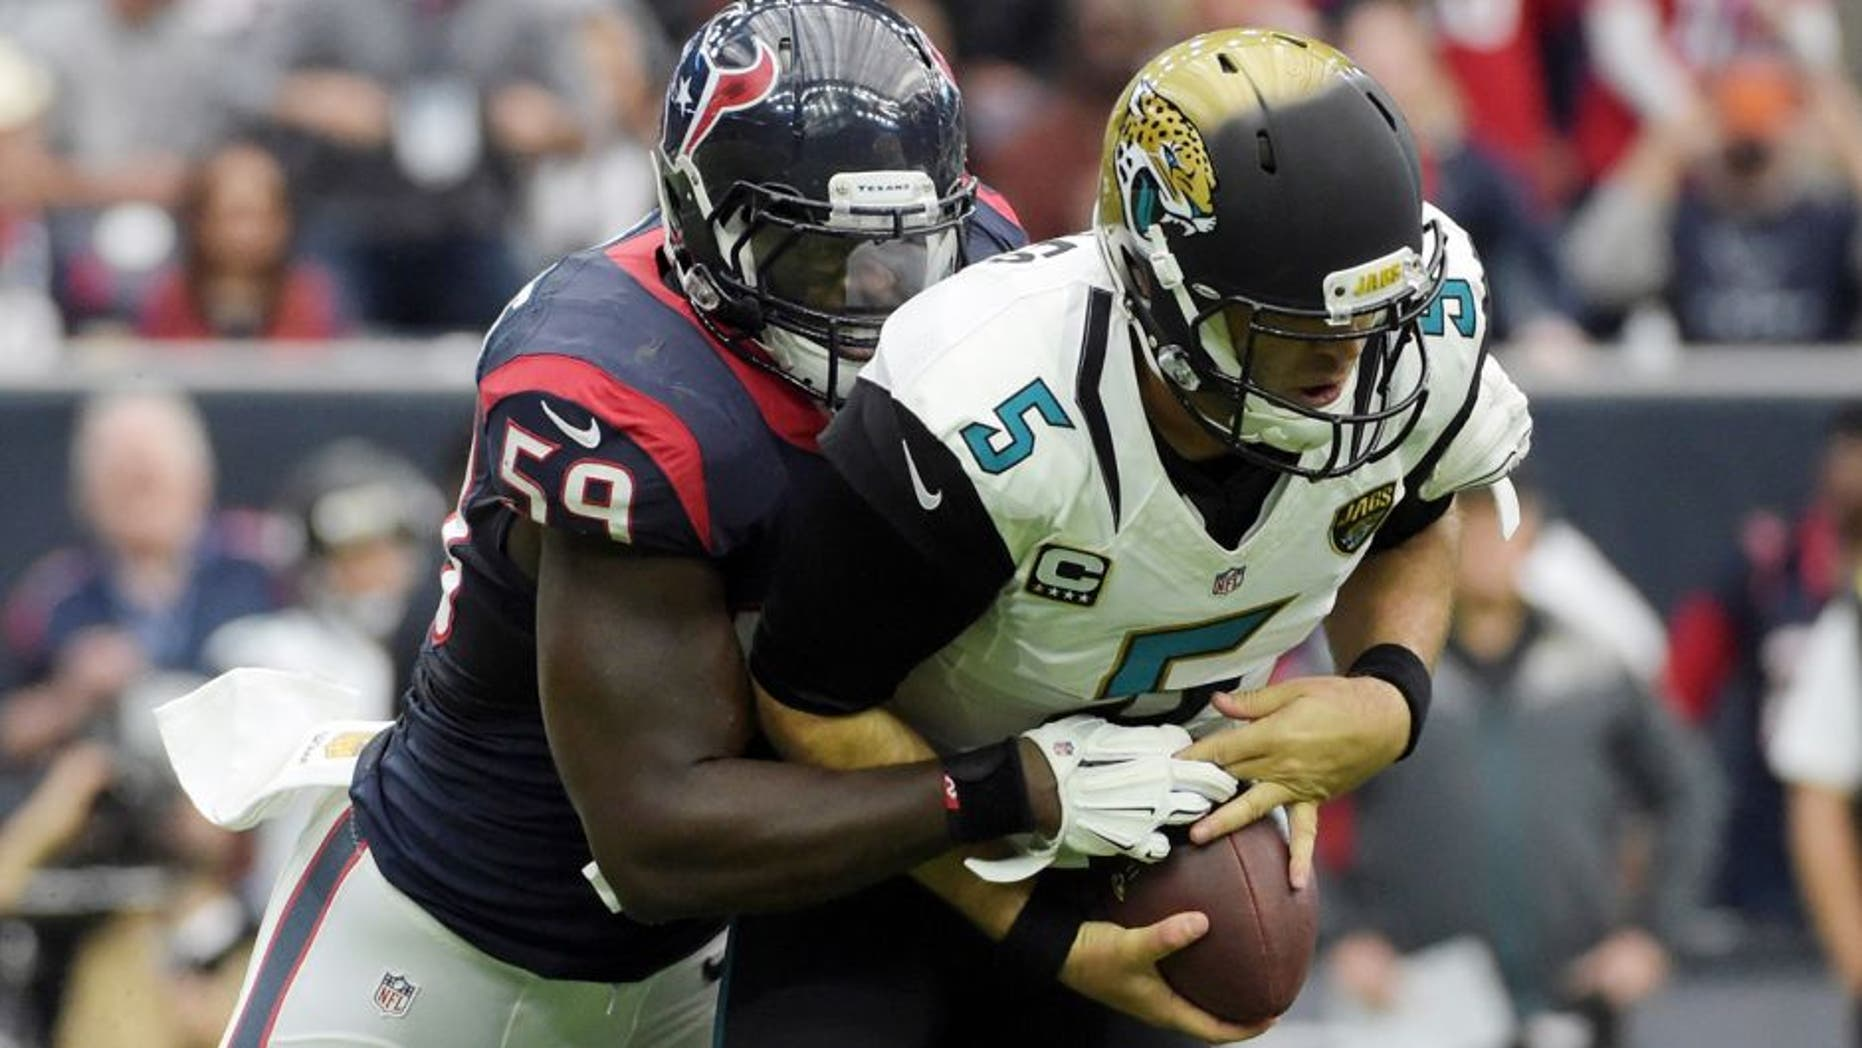 Jan 3, 2016; Houston, TX, USA; Houston Texans outside linebacker Whitney Mercilus (59) sacks Jacksonville Jaguars quarterback Blake Bortles (5) during an NFL football game at NRG Stadium. Mandatory Credit: Kirby Lee-USA TODAY Sports